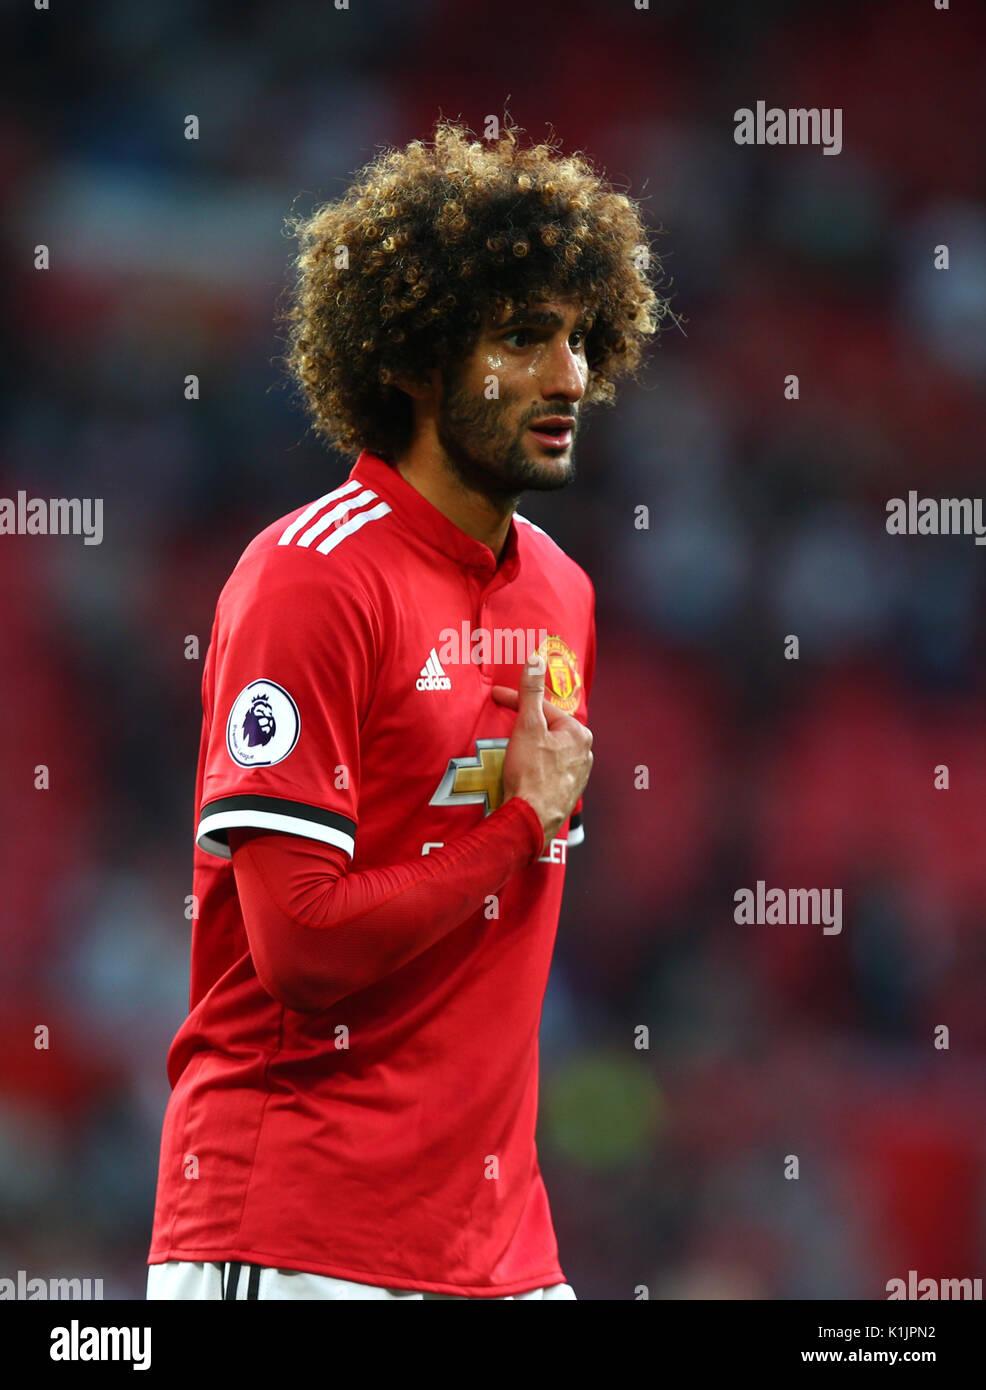 Manchester Uniteds Marouane Fellaini During Stock s